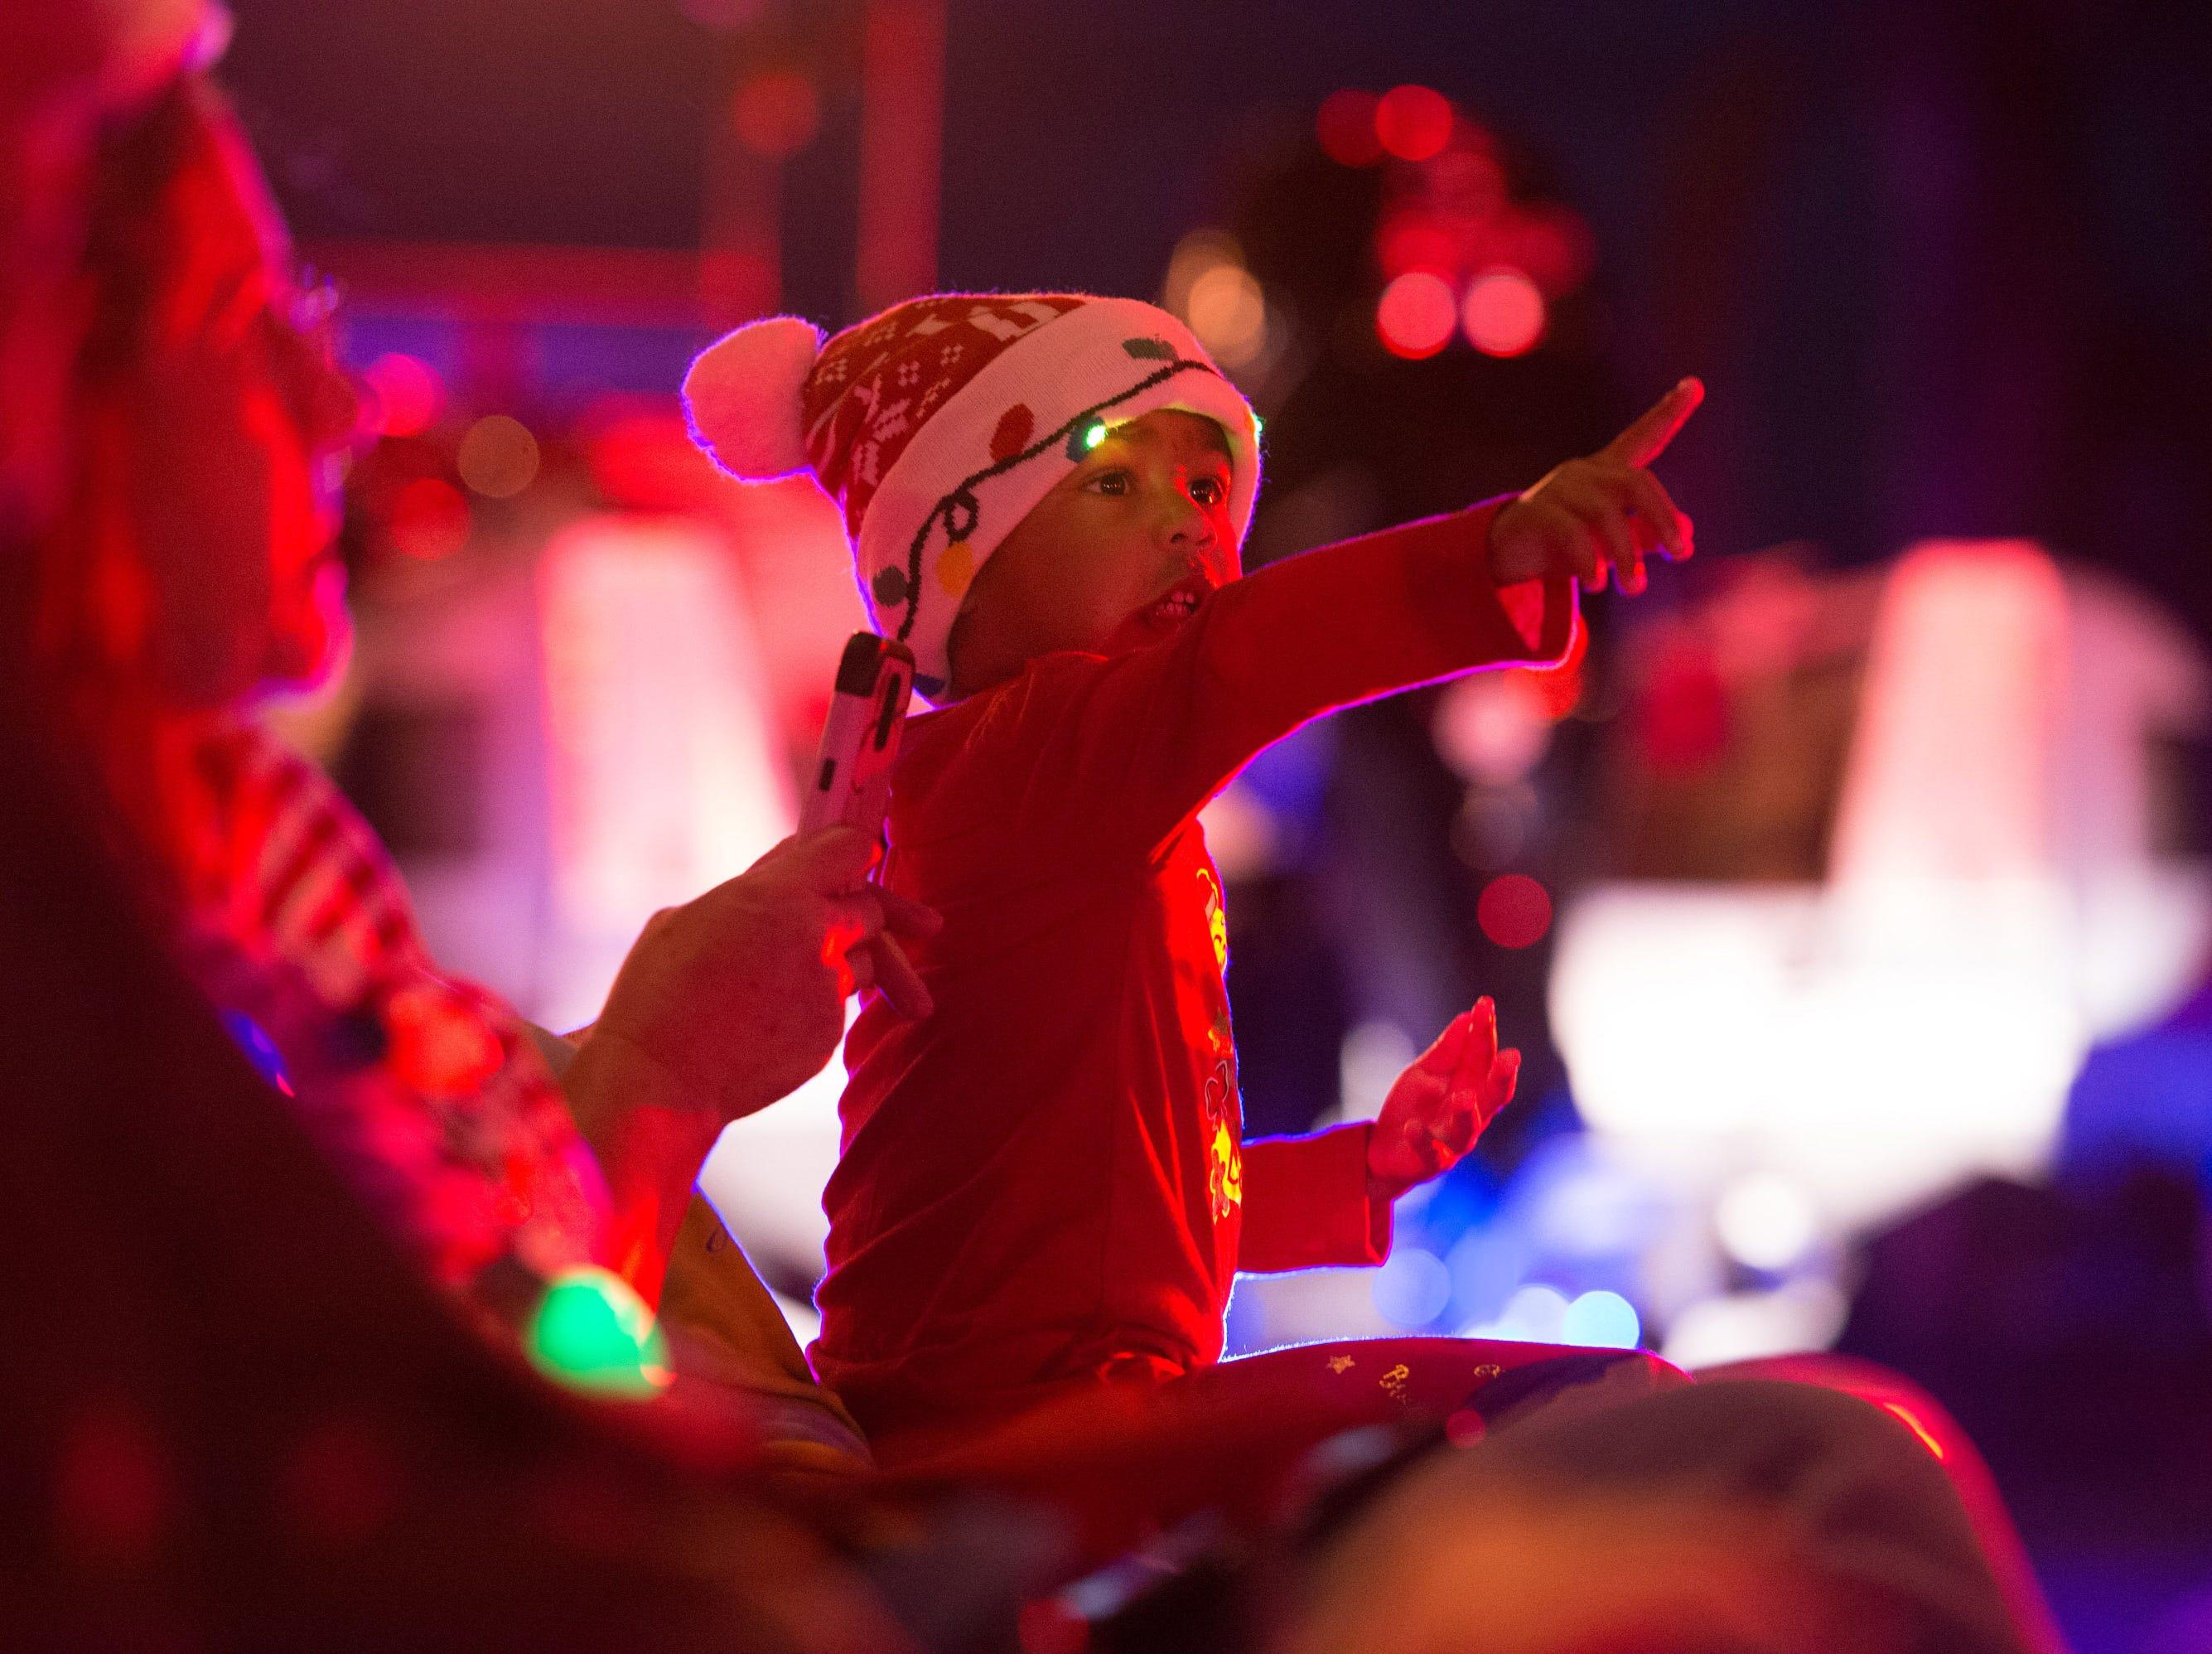 Participants and spectators celebrate the season at the Sebastian Christmas Parade on Saturday, Dec. 1, 2018, in Sebastian.